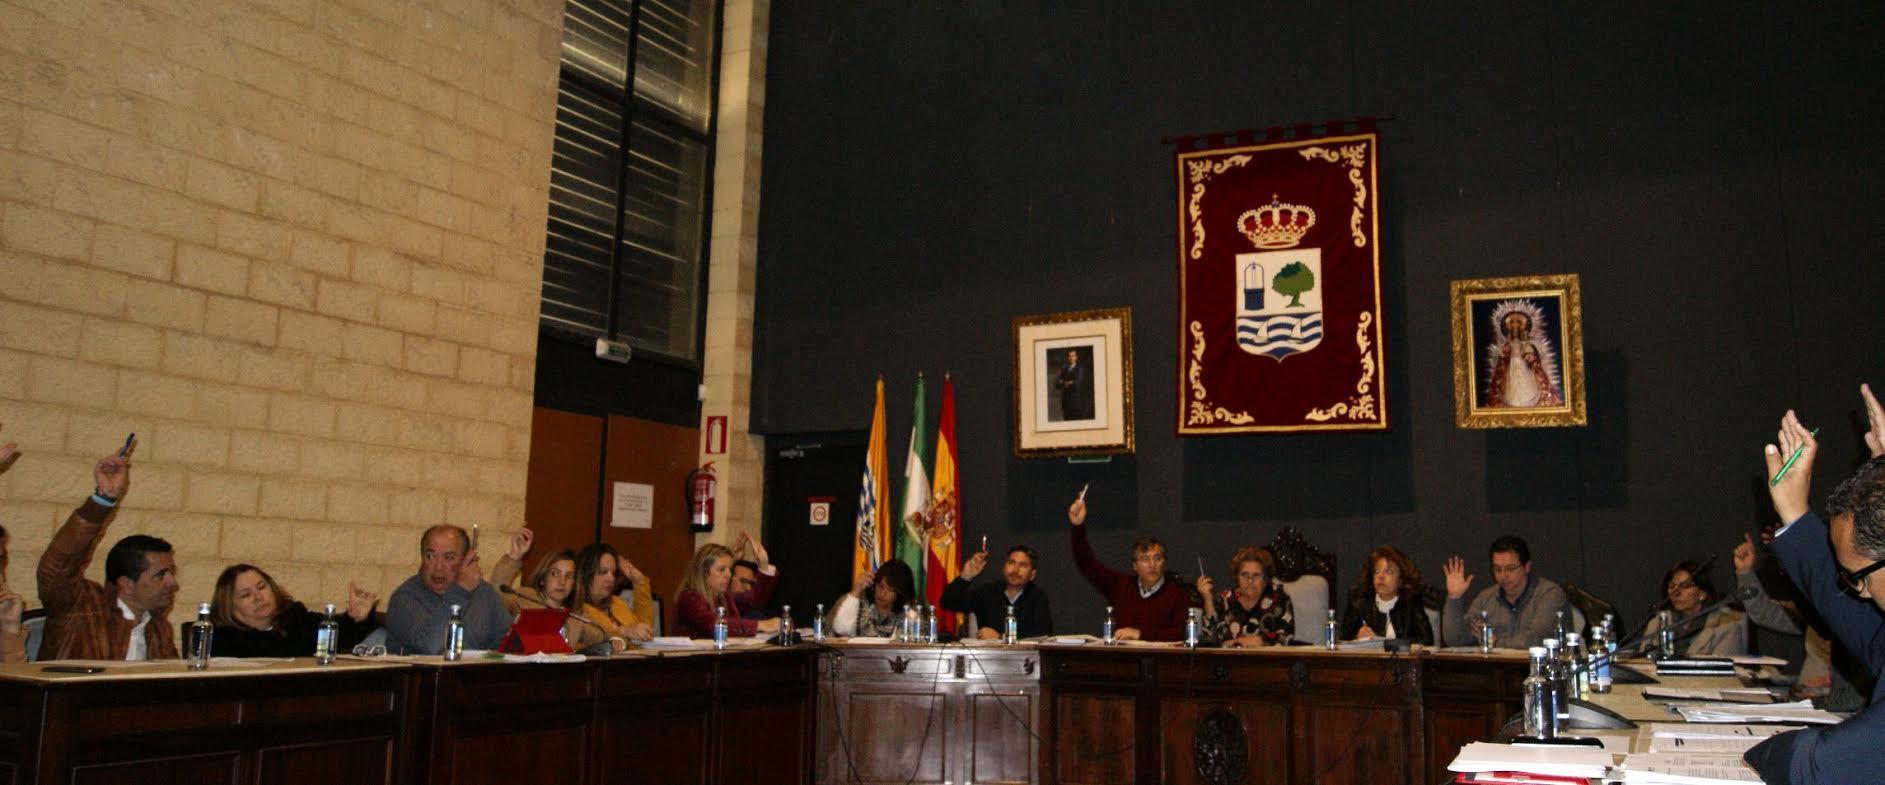 Pleno Ordinario de marzo en Isla Cristina